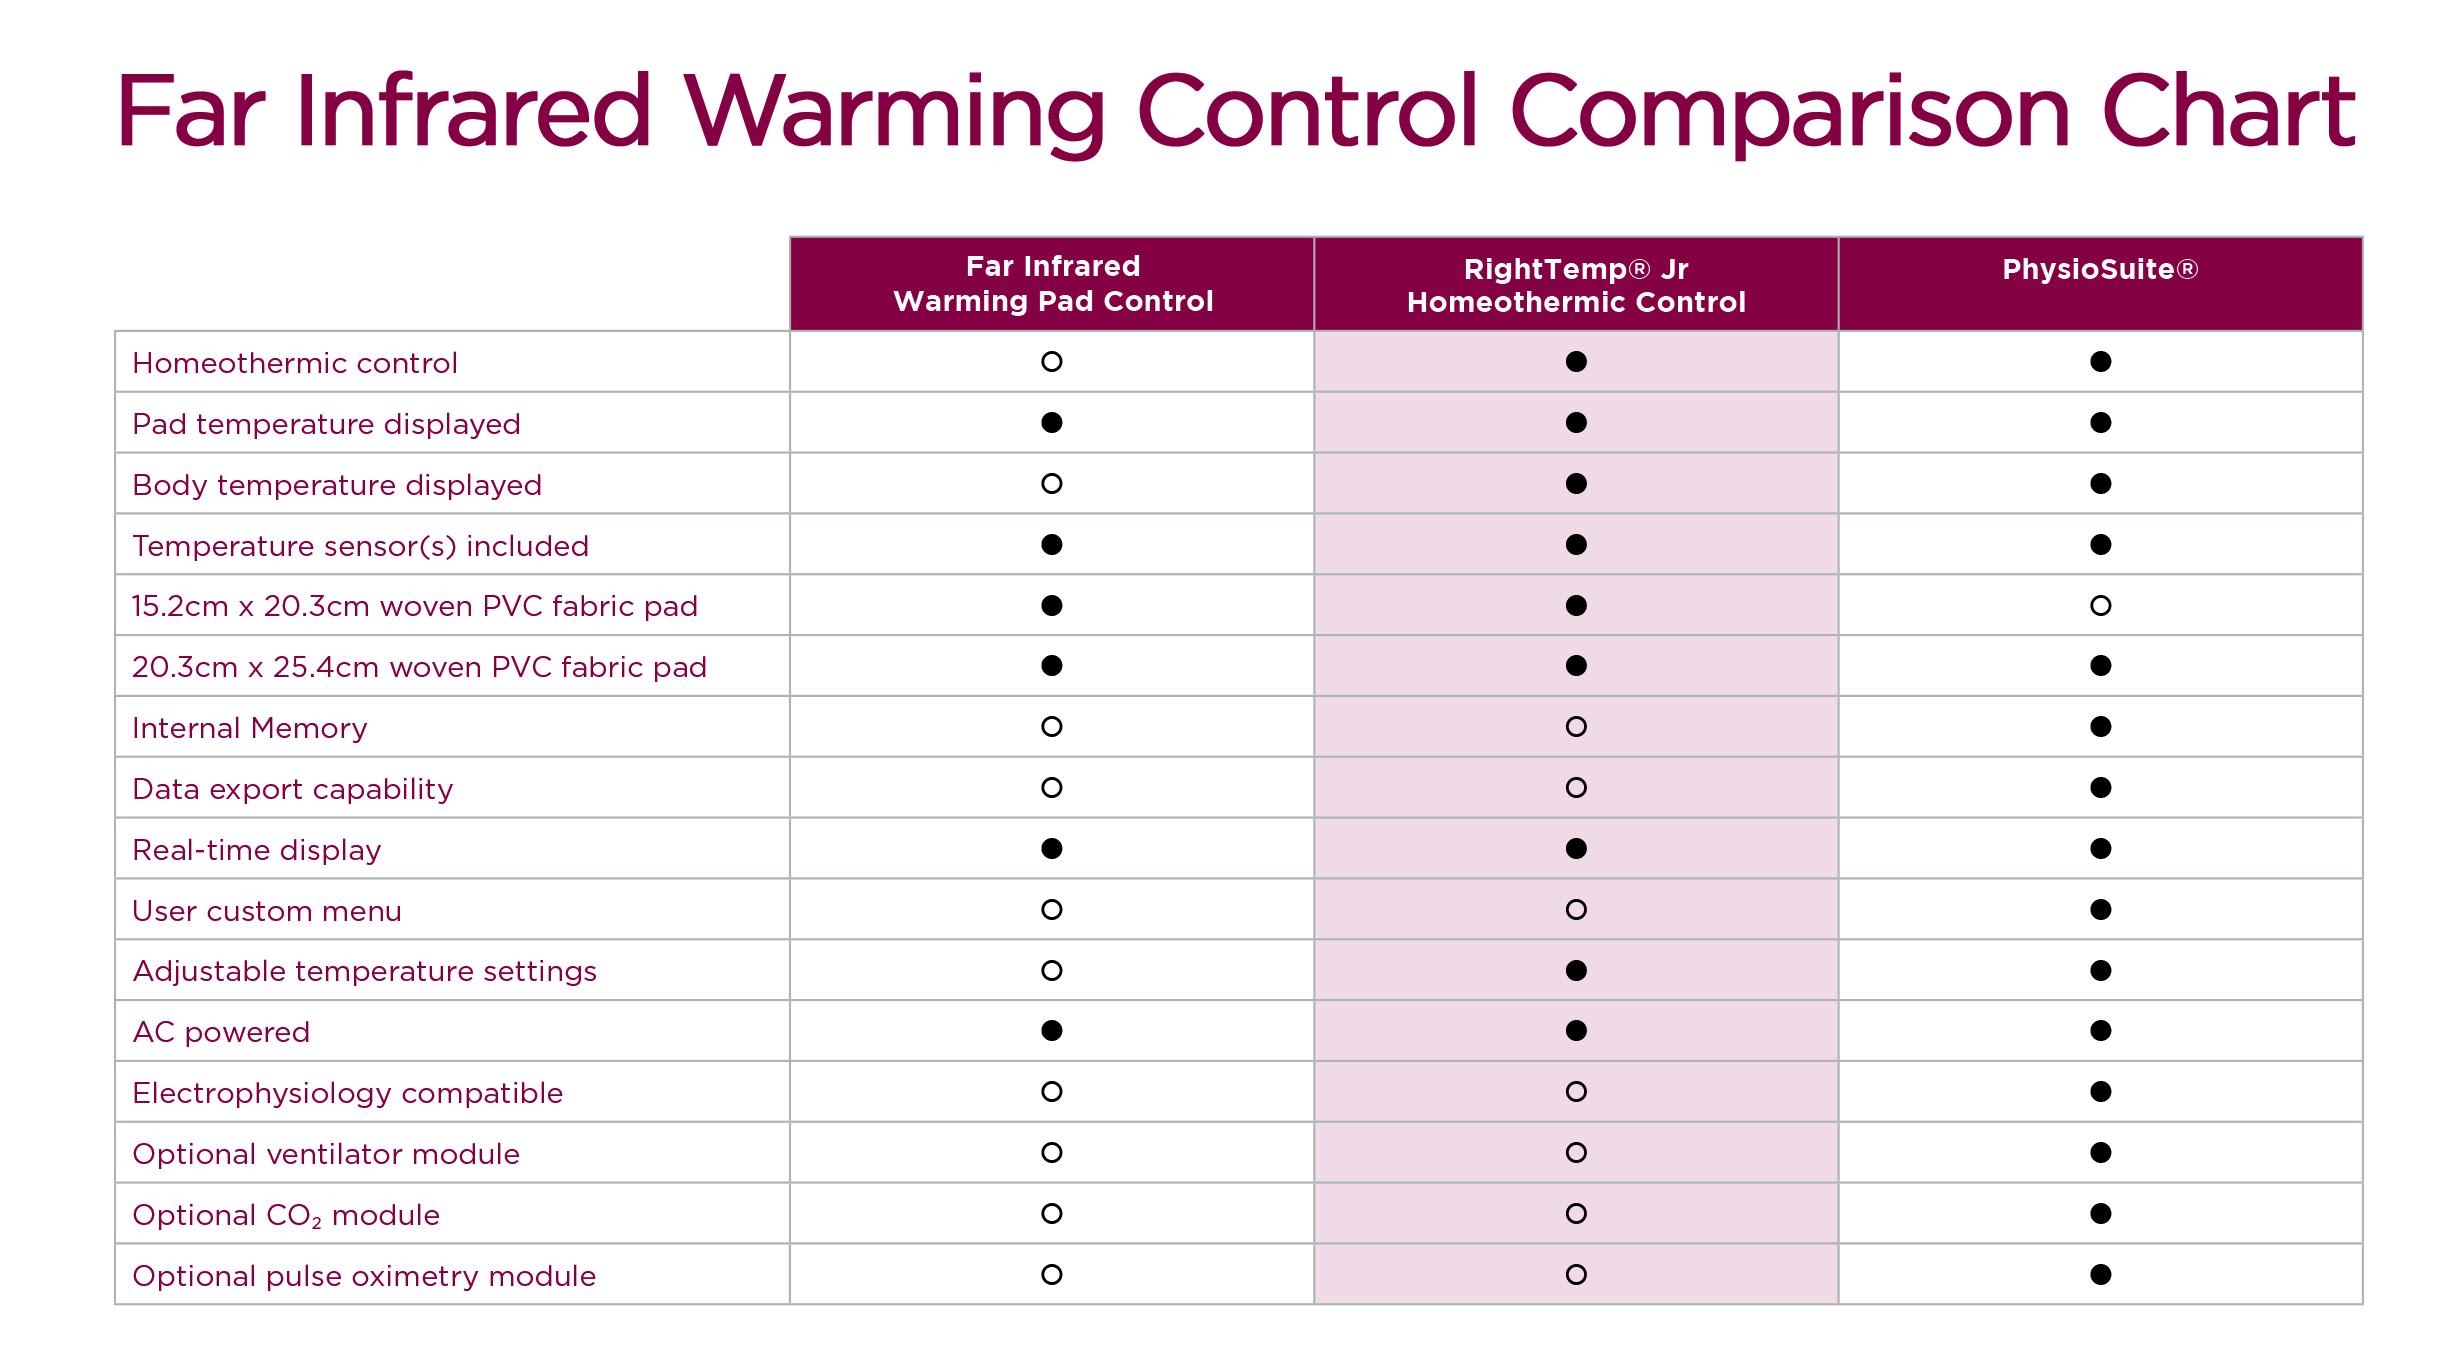 Far Infrared Warming Control Comparison Chart